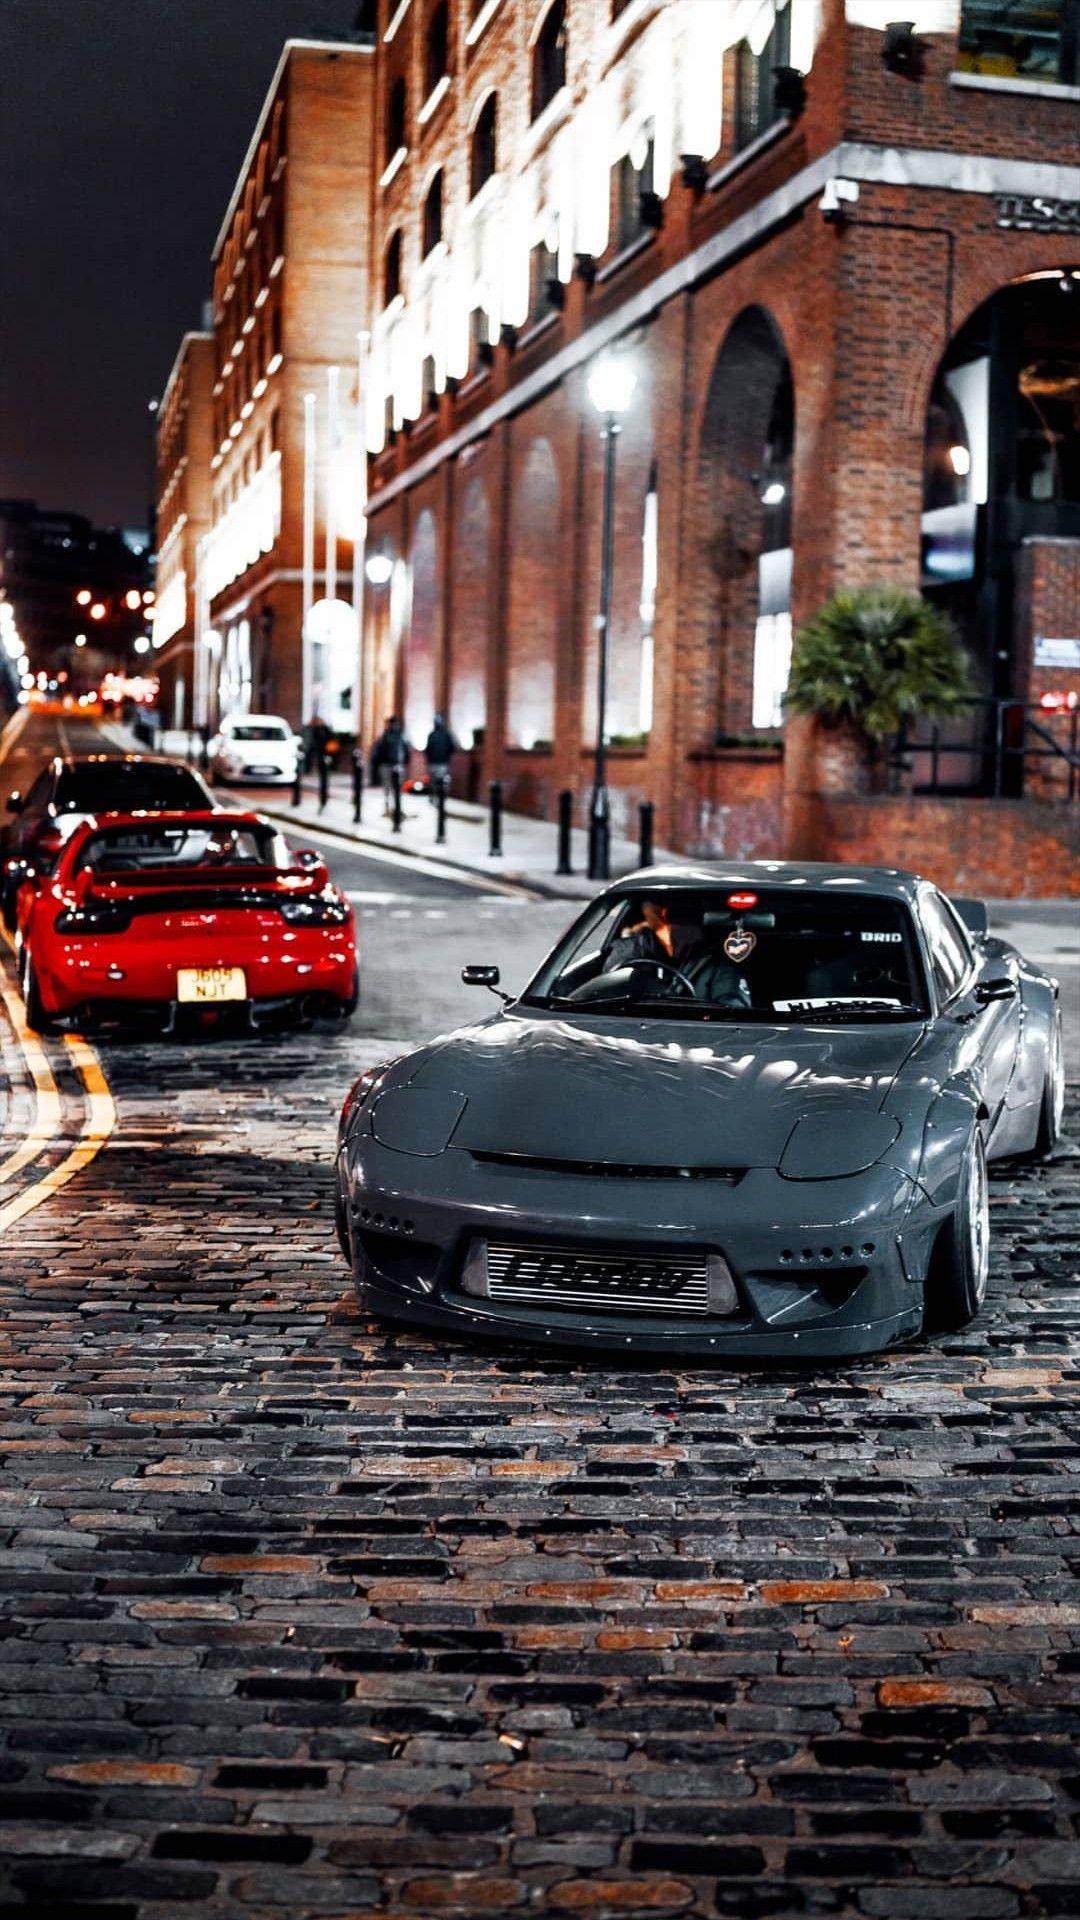 Mike Crawat Best Jdm Cars Jdm Cars Neon Car